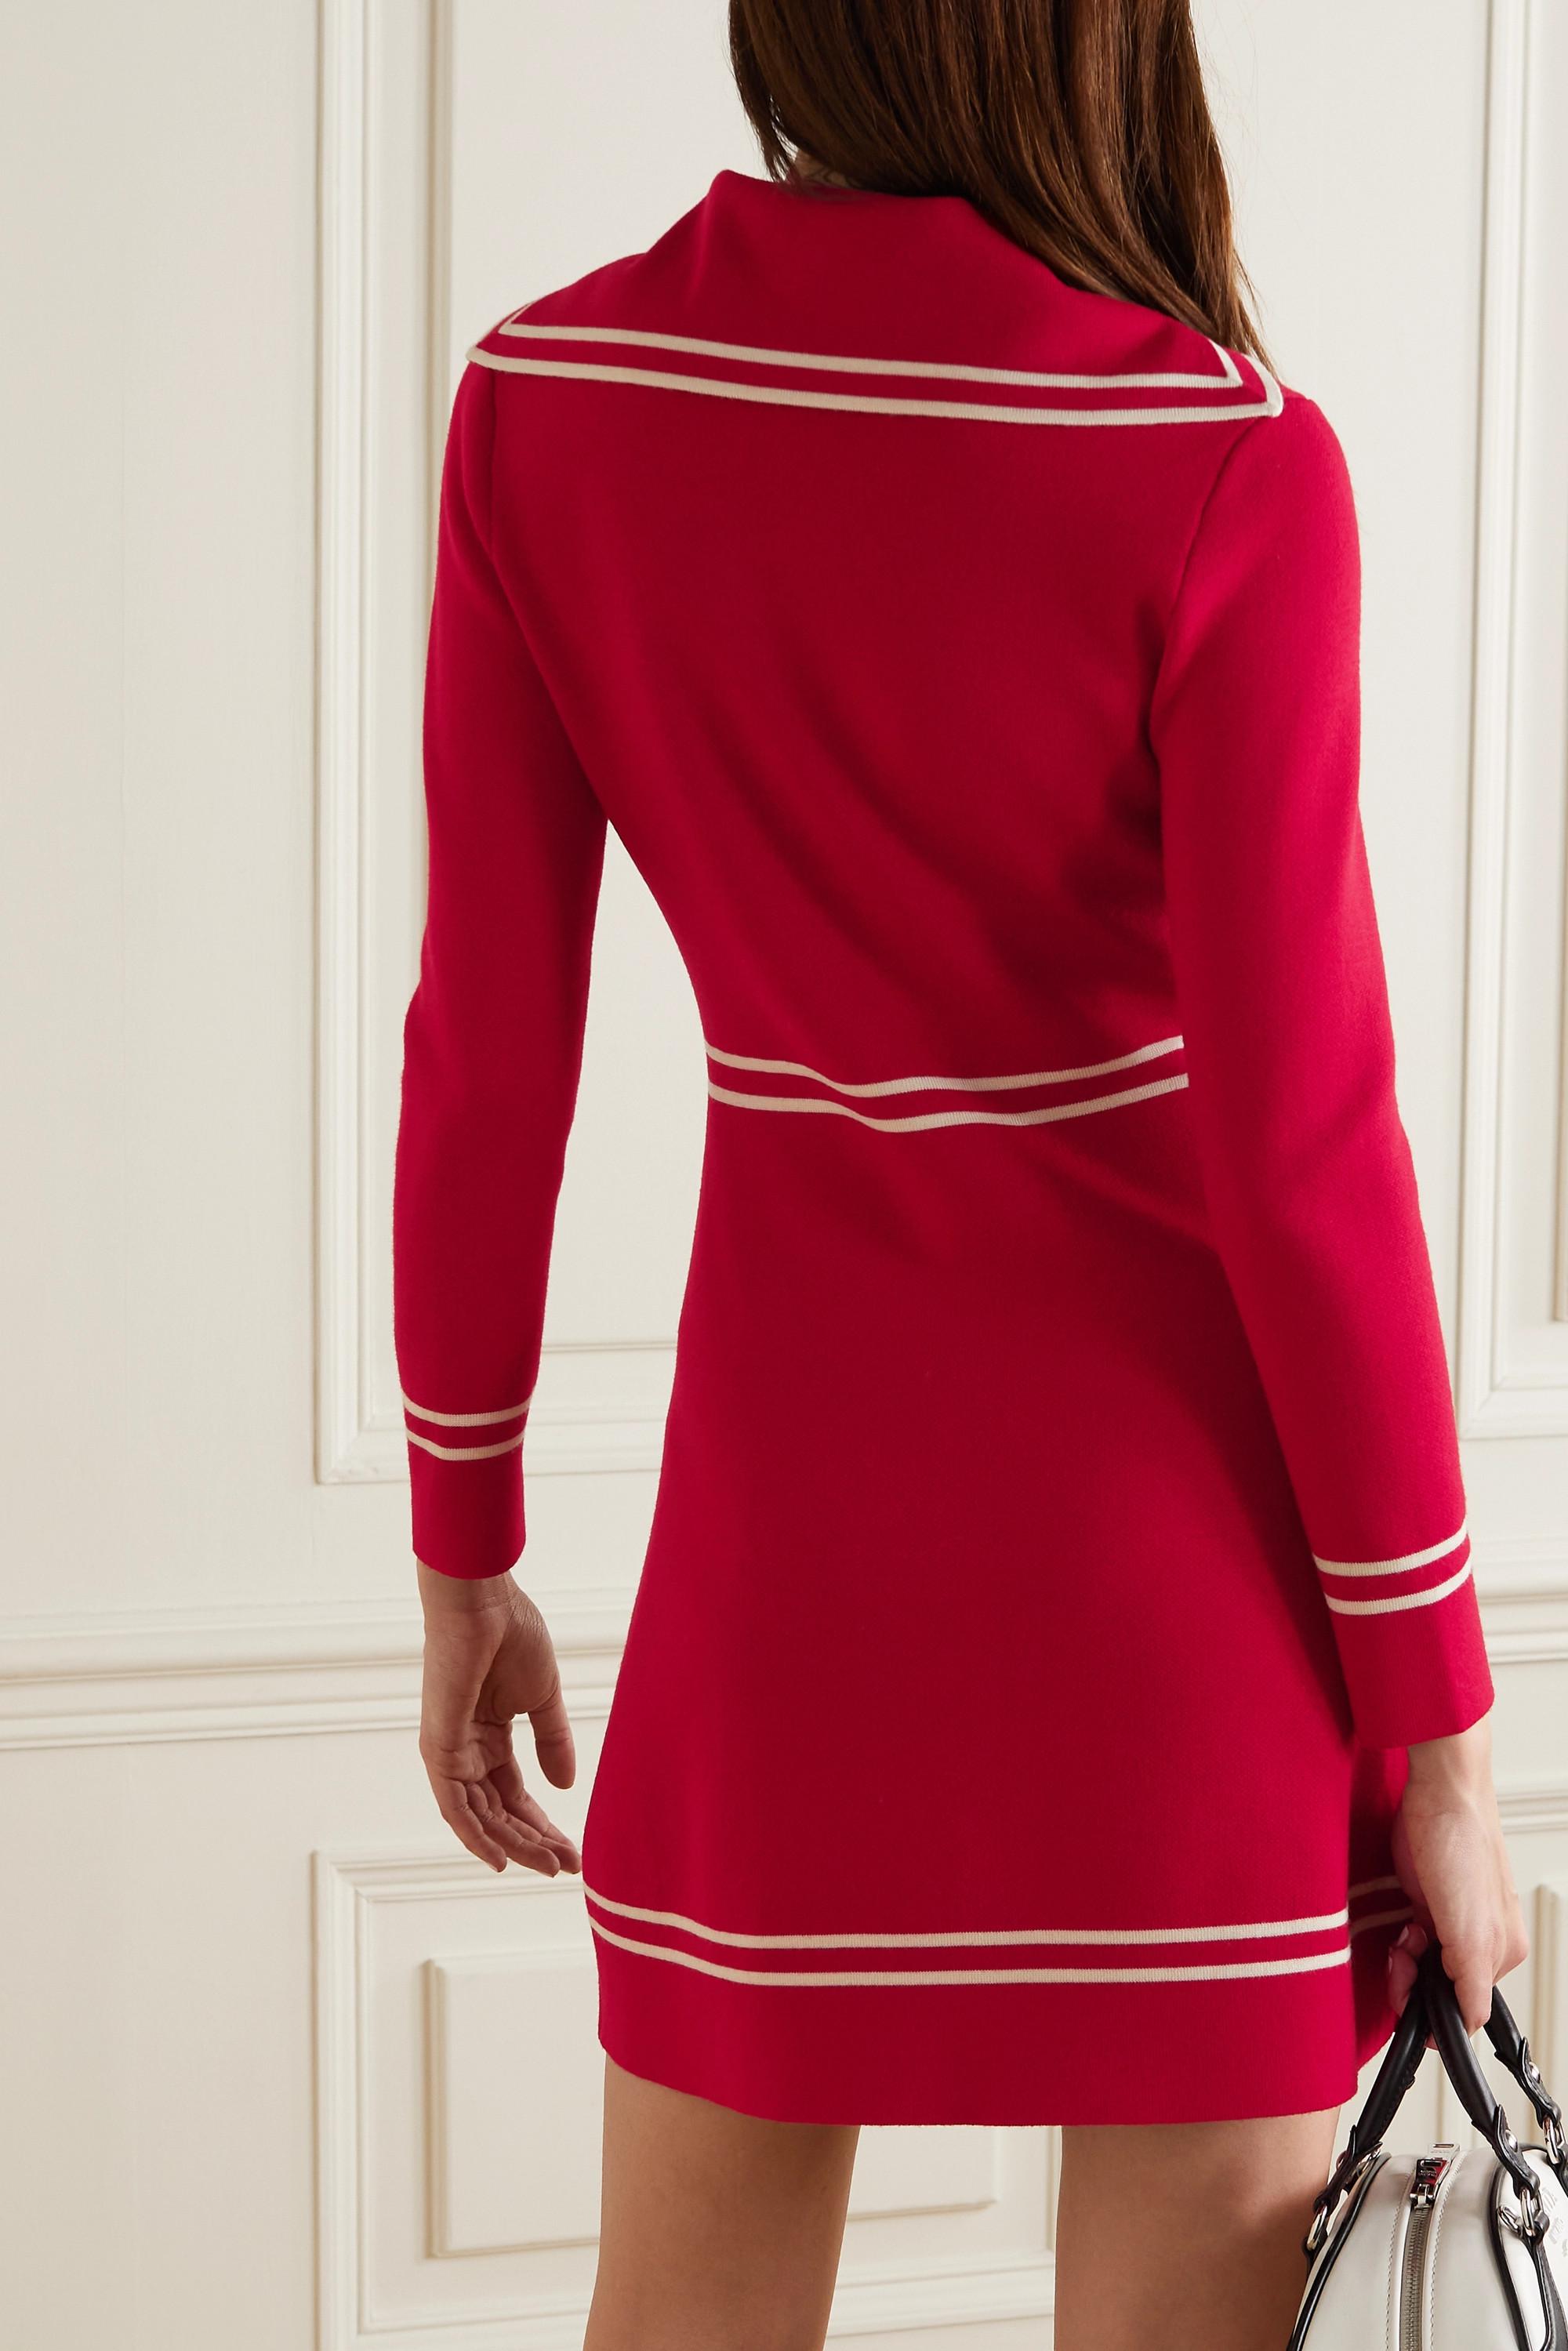 Gucci Horsebit-detailed wool-jacquard mini dress